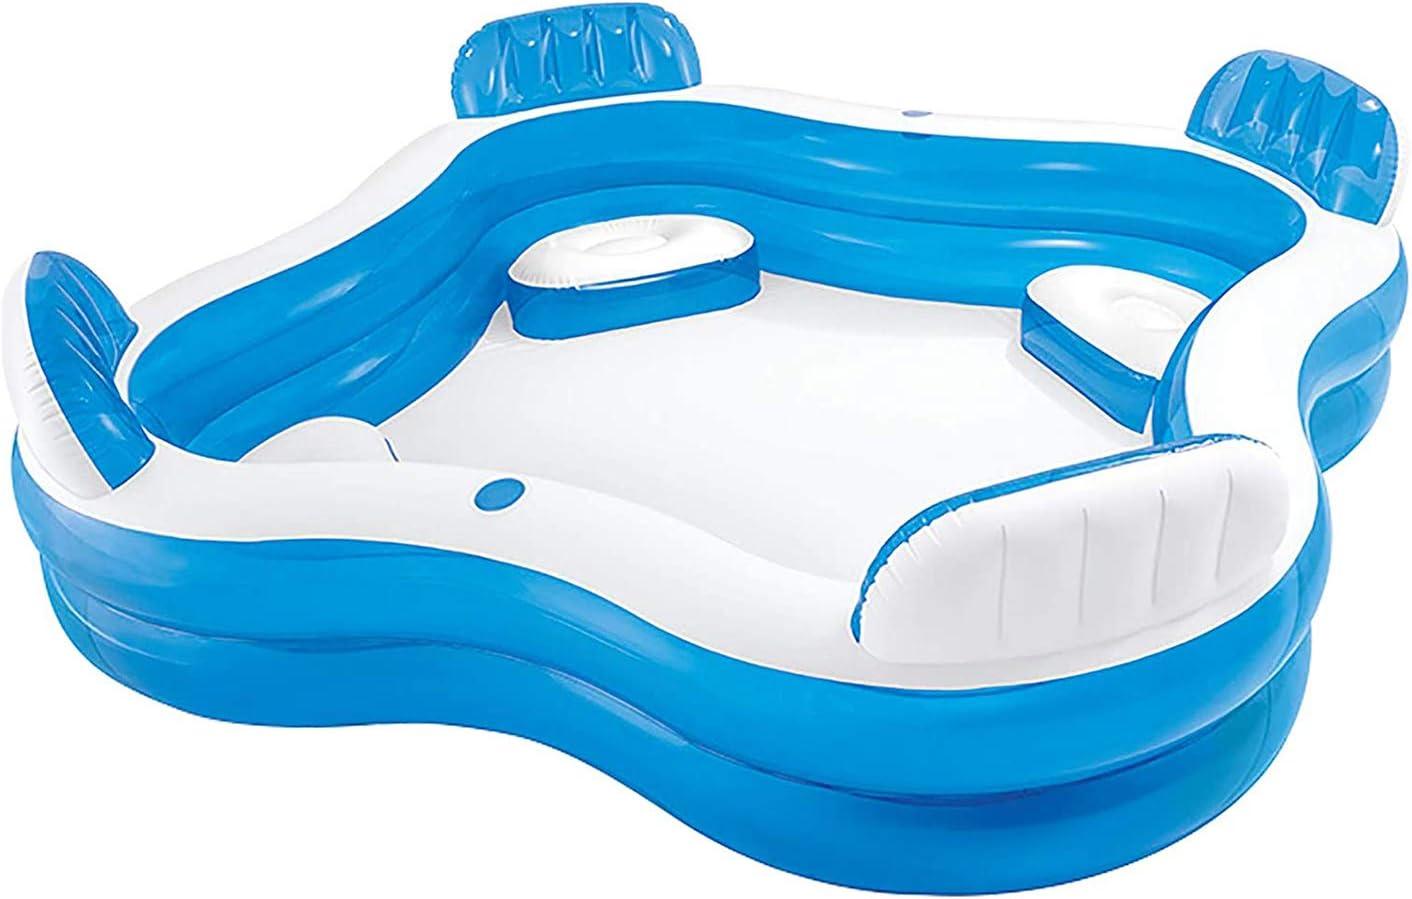 Xb Piscina Inflable, Swim Center Pool Familia con Asientos, baño Engrosada Transparente, 229 x 229 x 56 cm